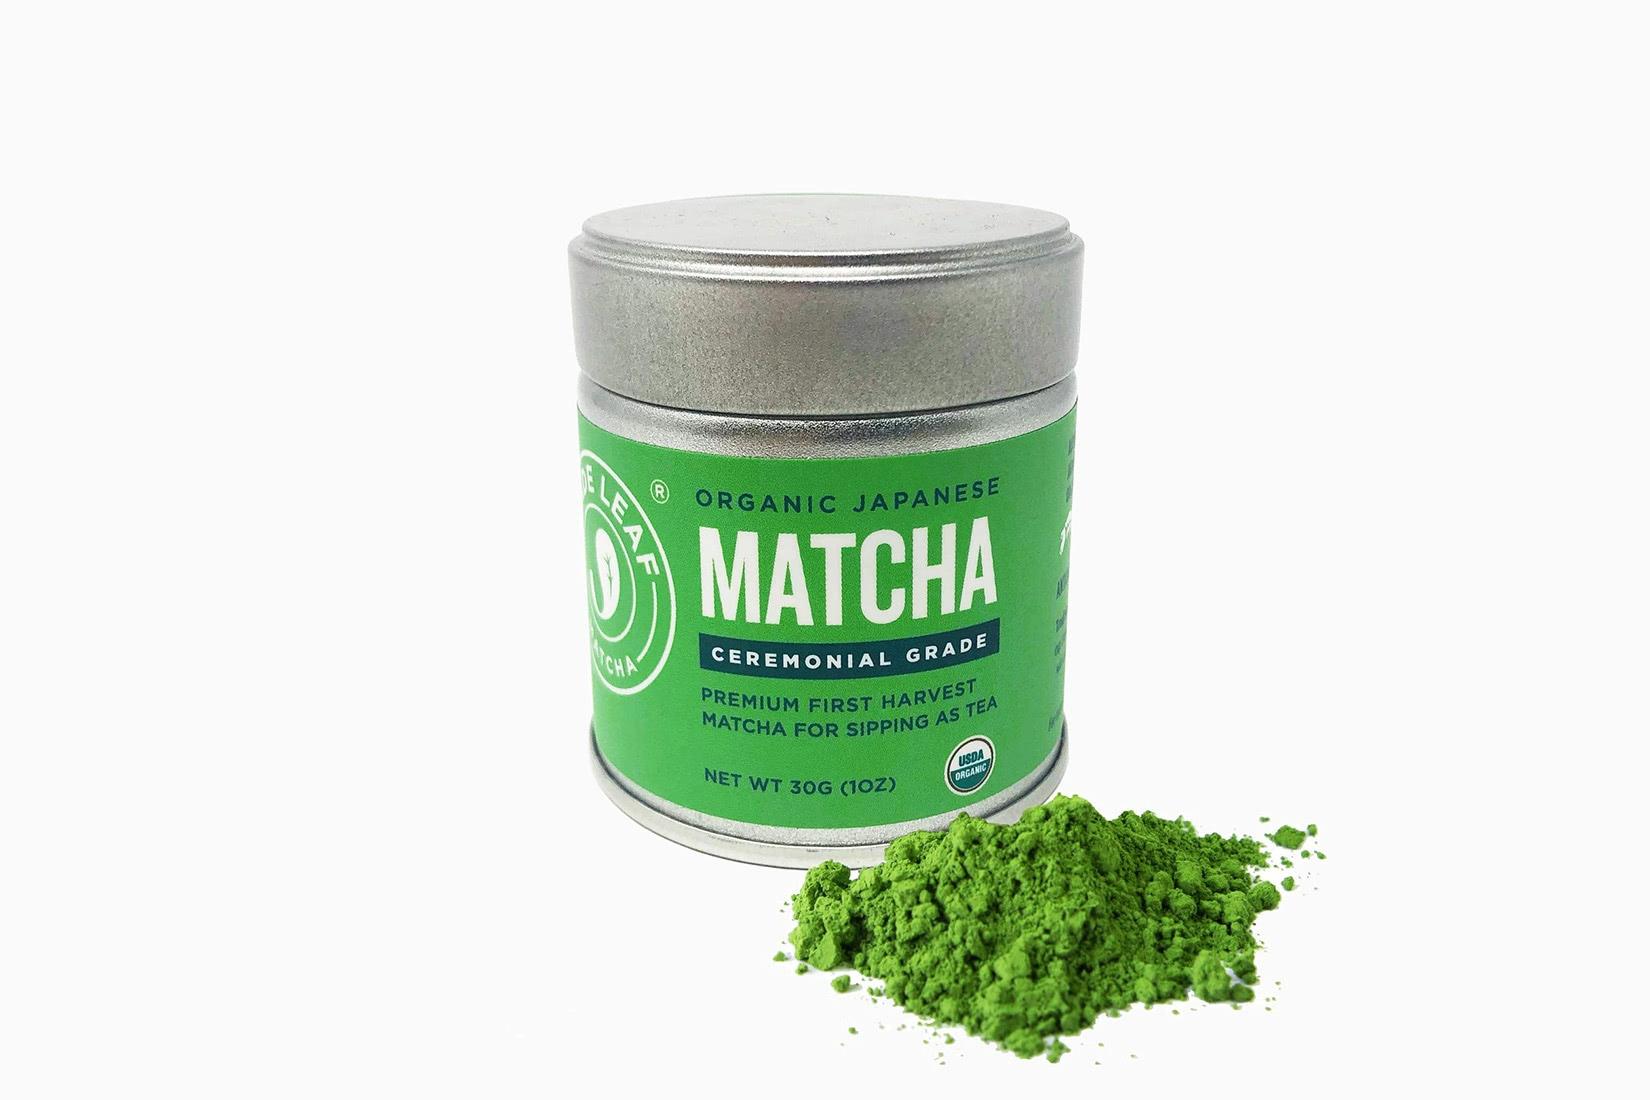 best tea brands matcha jade leaf organic - Luxe Digital